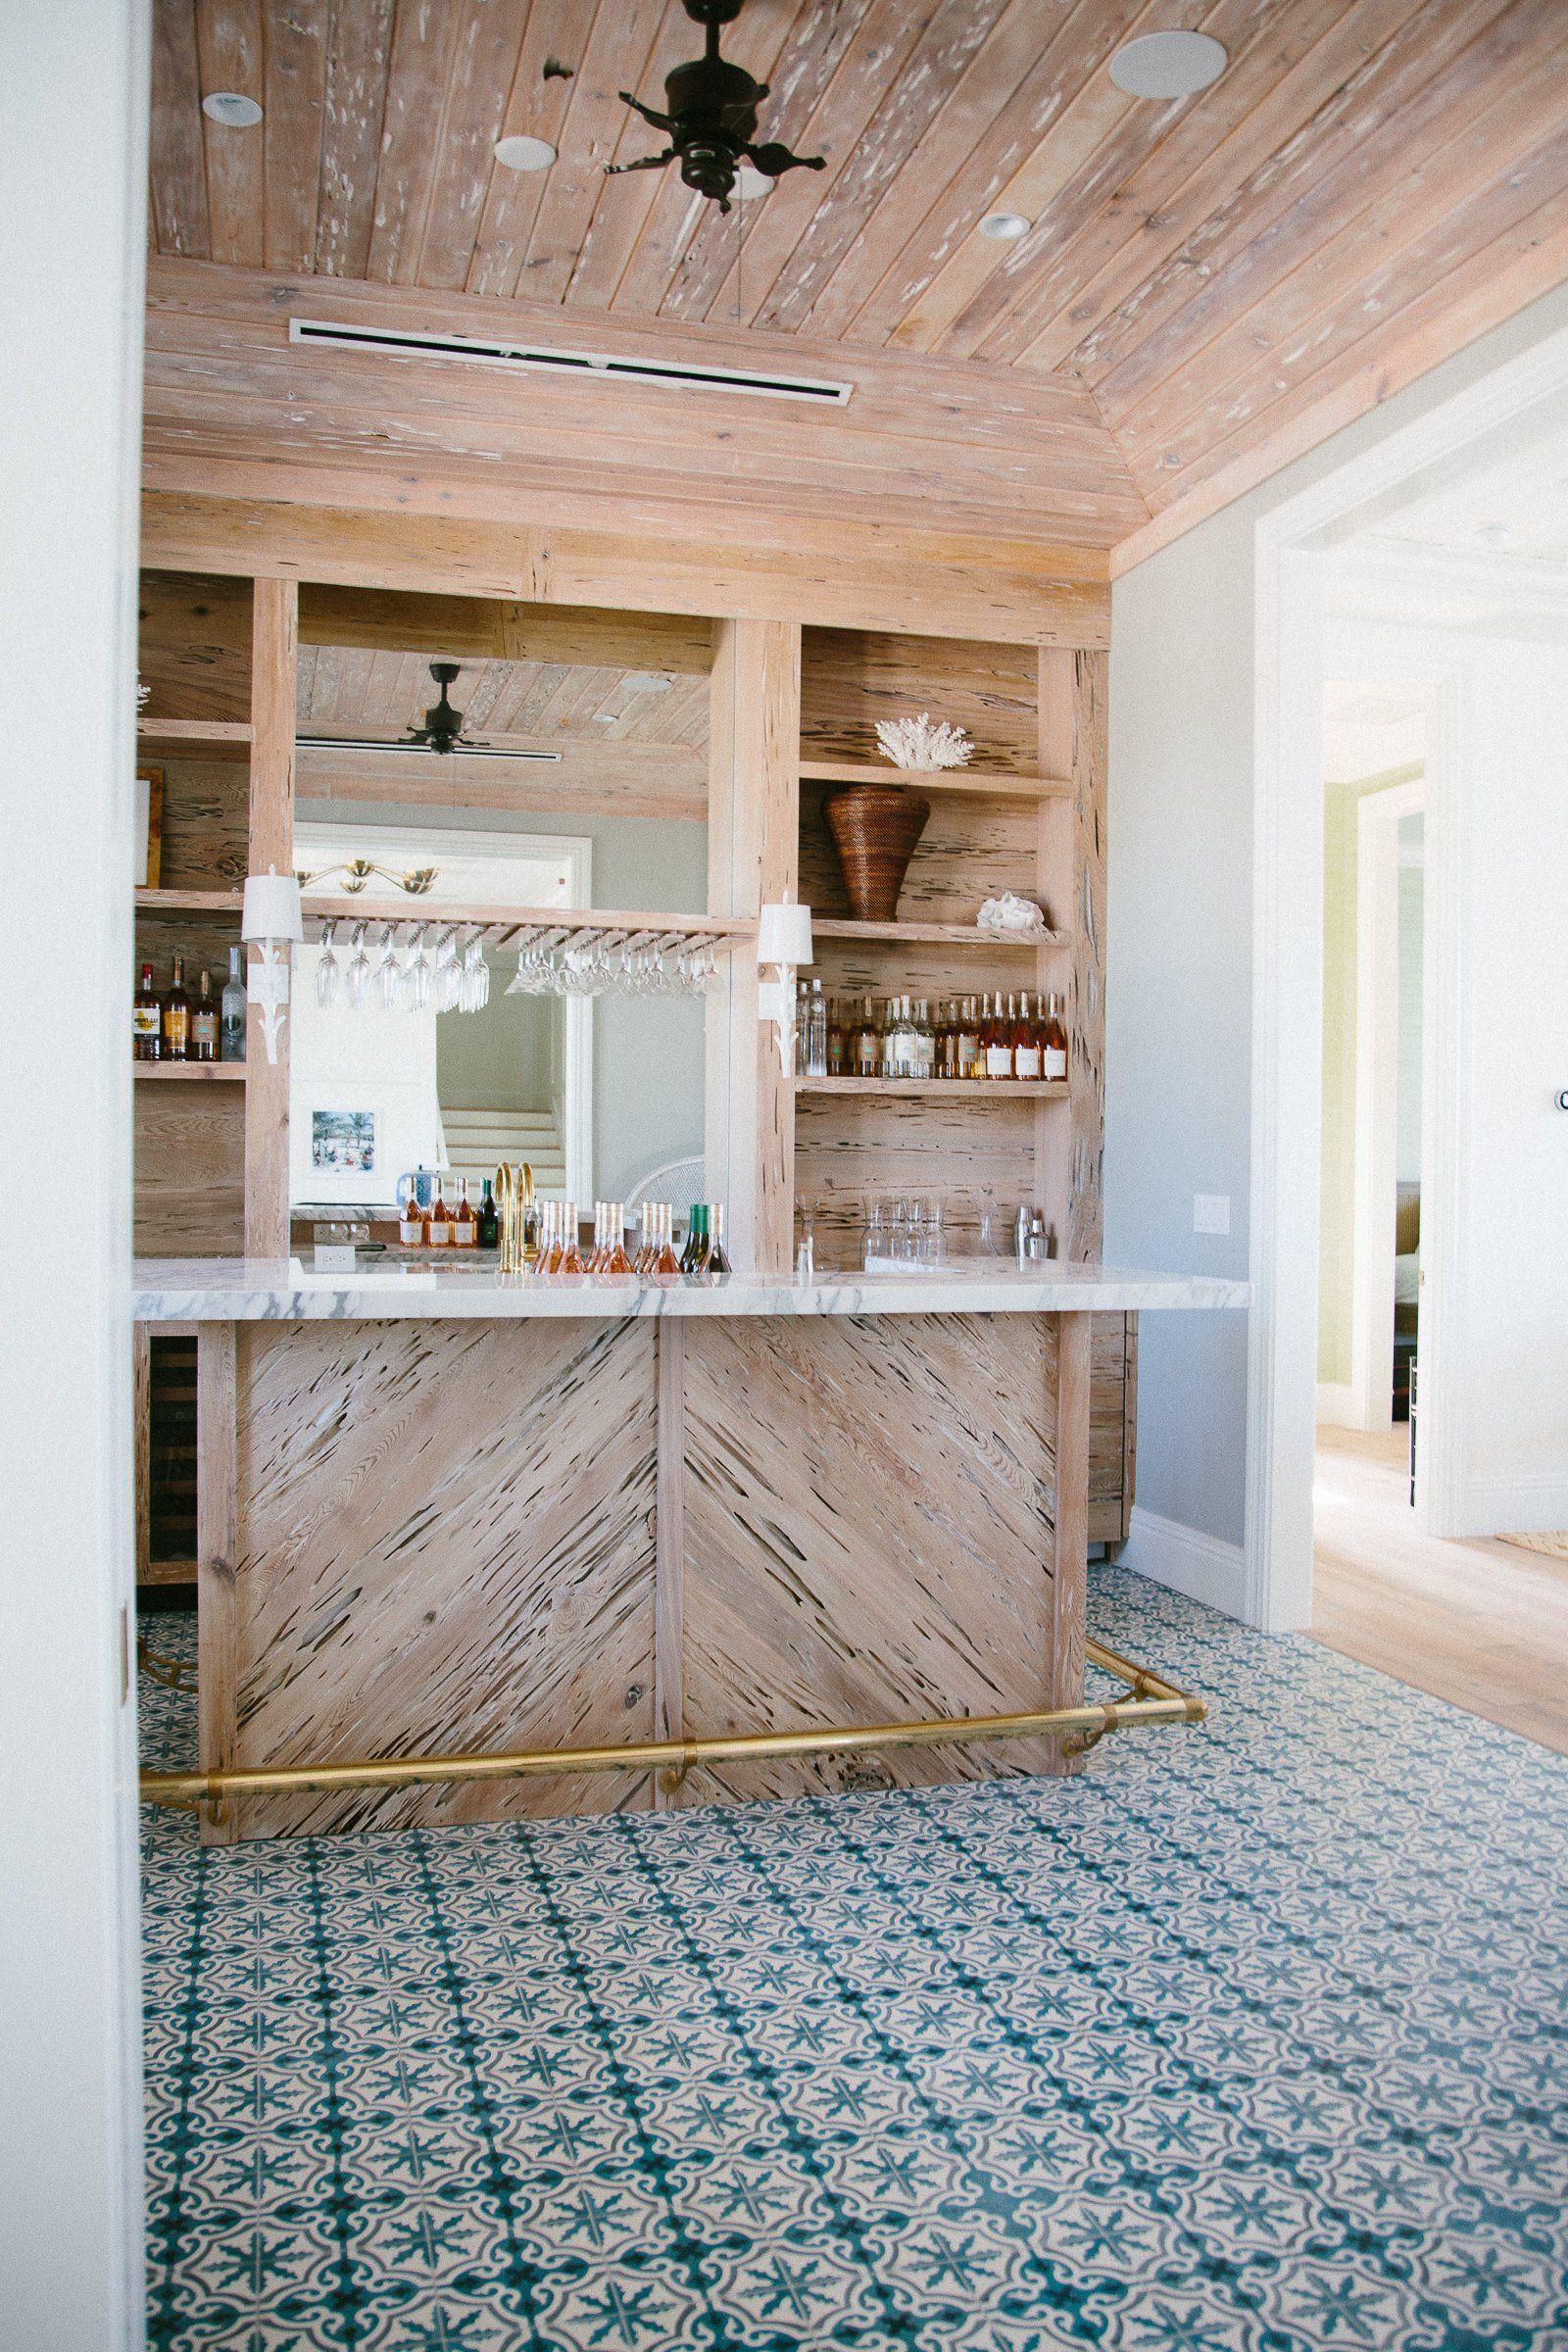 Best Places Ever: Bahamas Beach House | Worm Eaten Wood Bar And Cuban Tile